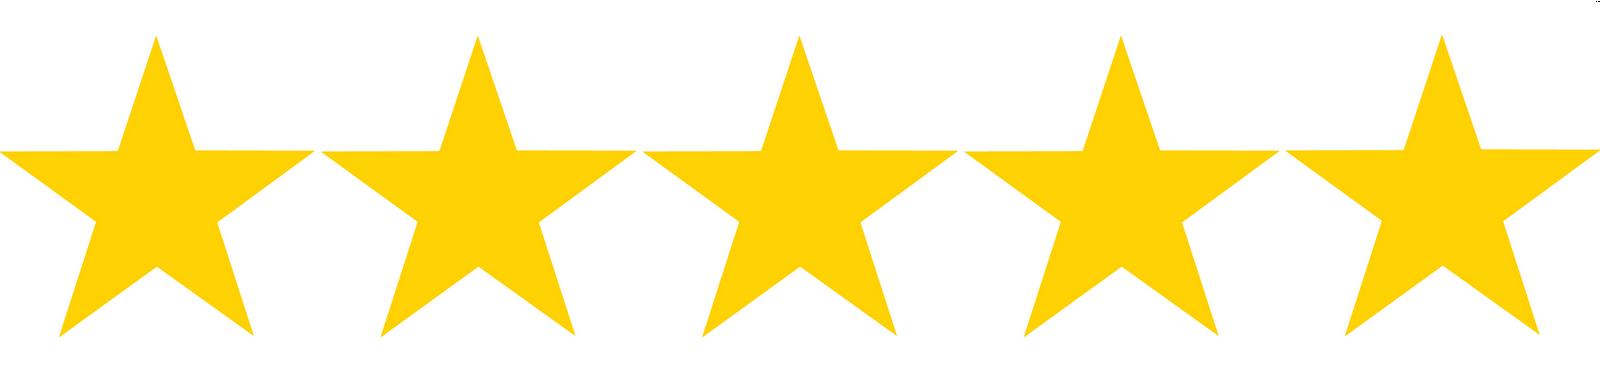 Free Stars Line Cliparts, Download Free Clip Art, Free Clip.